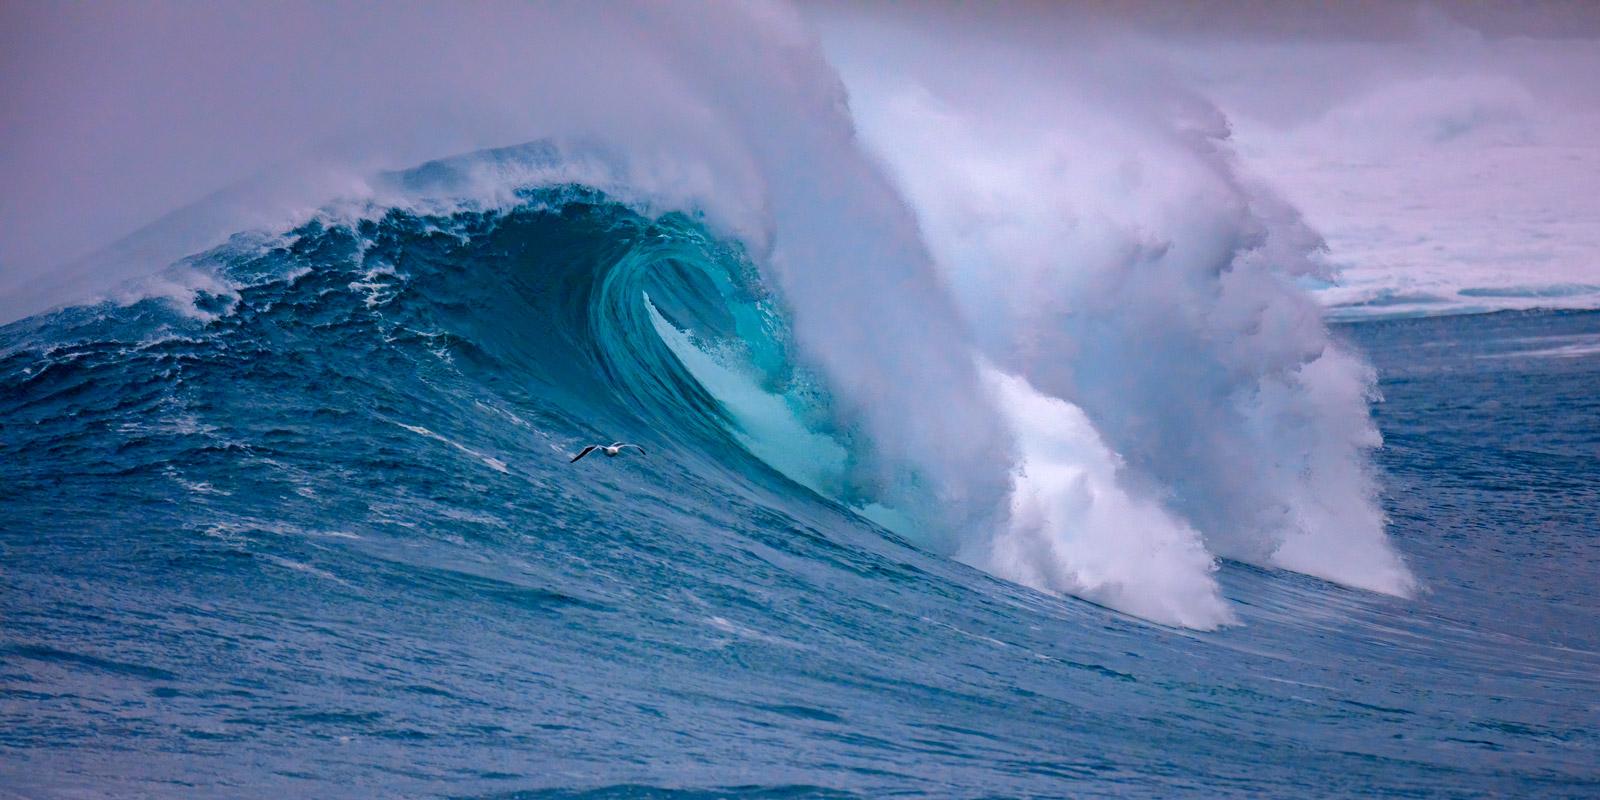 California, Carmel, Storm, Wave, limited edition, photograph, fine art, landscape, coast, photo